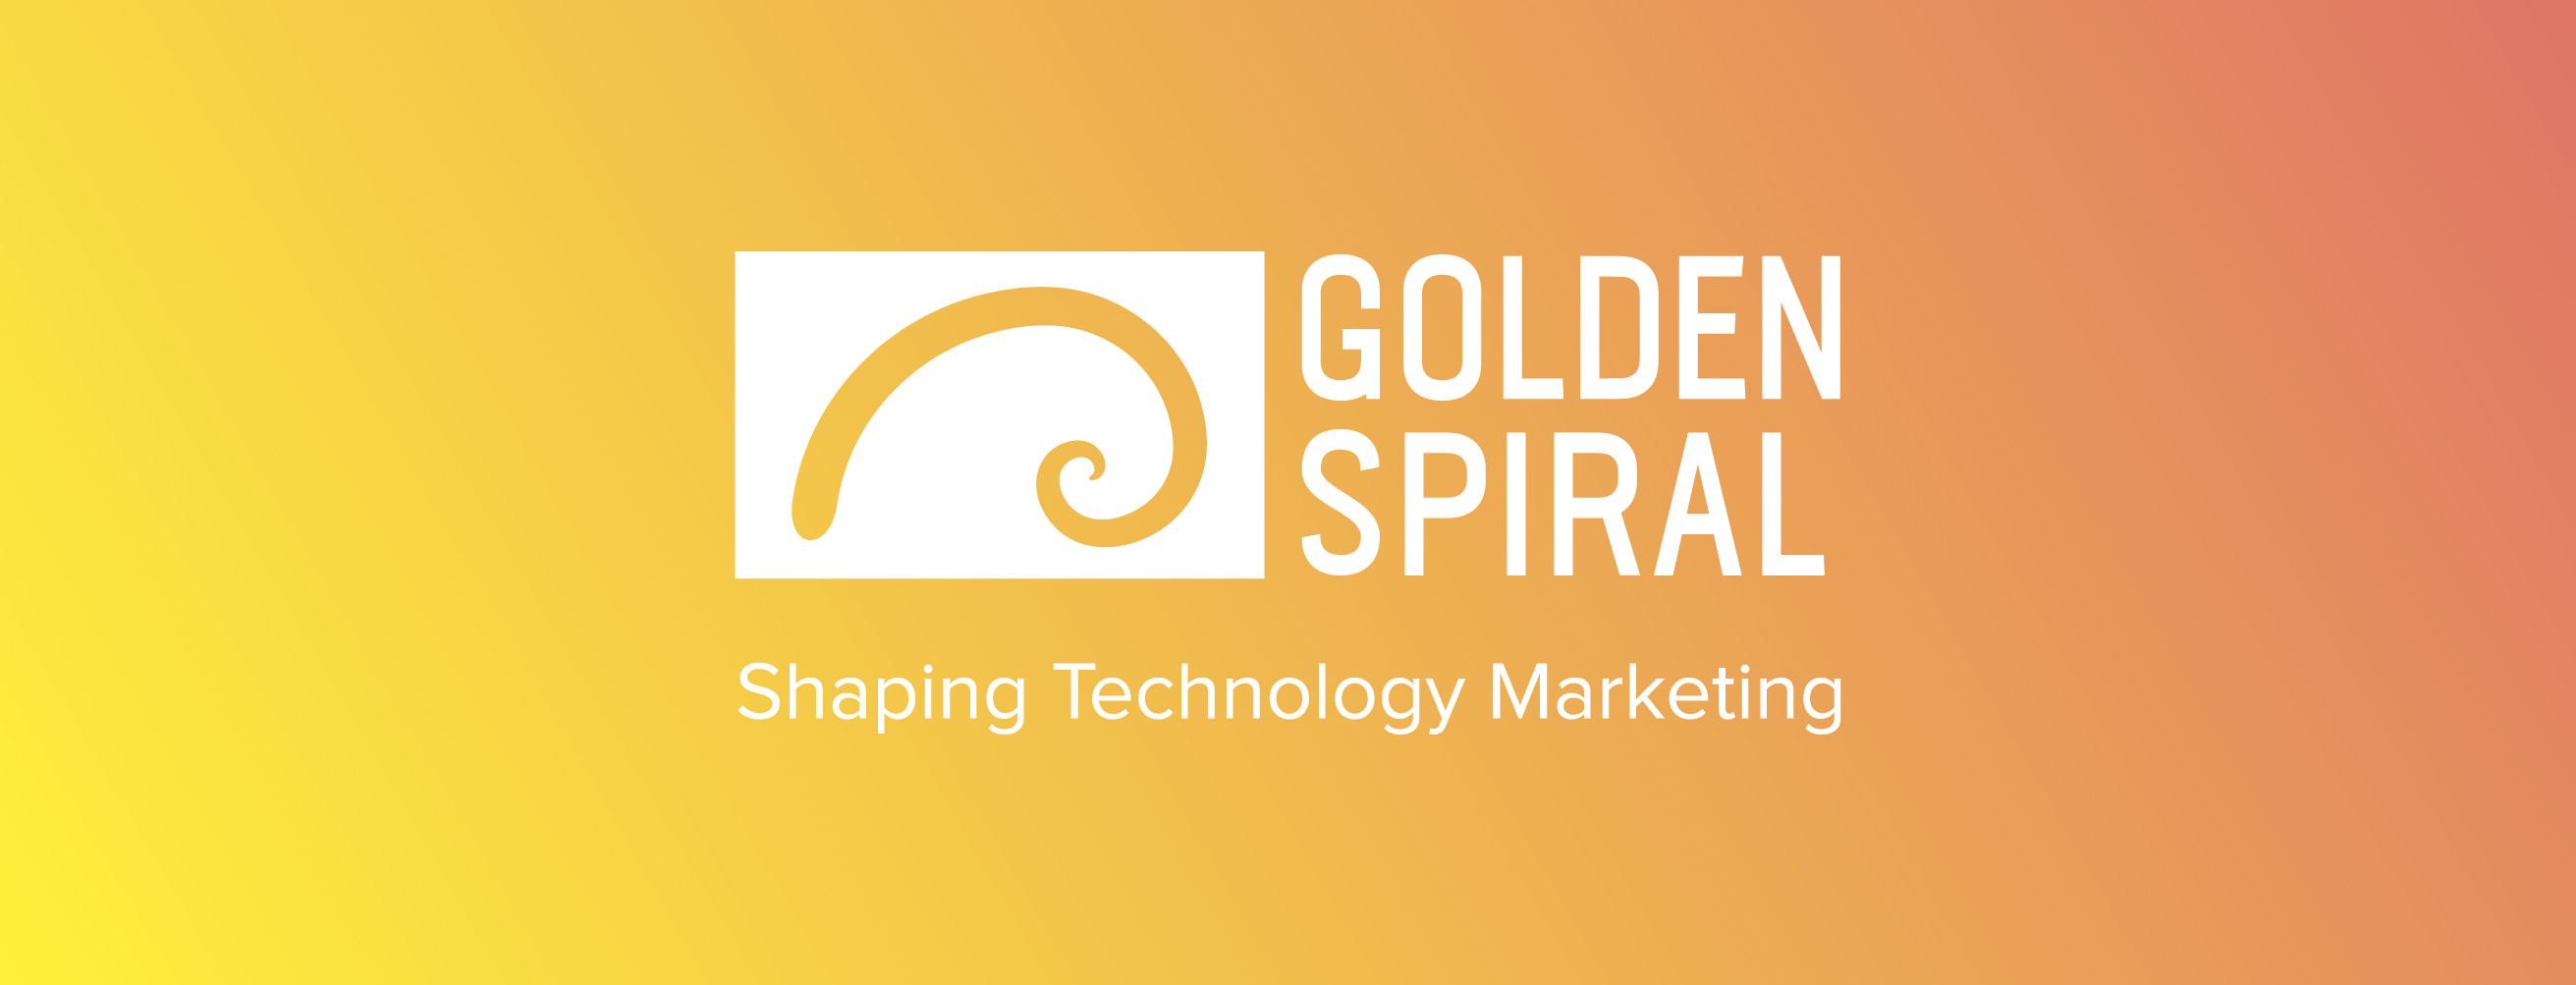 Golden spiral marketing agency